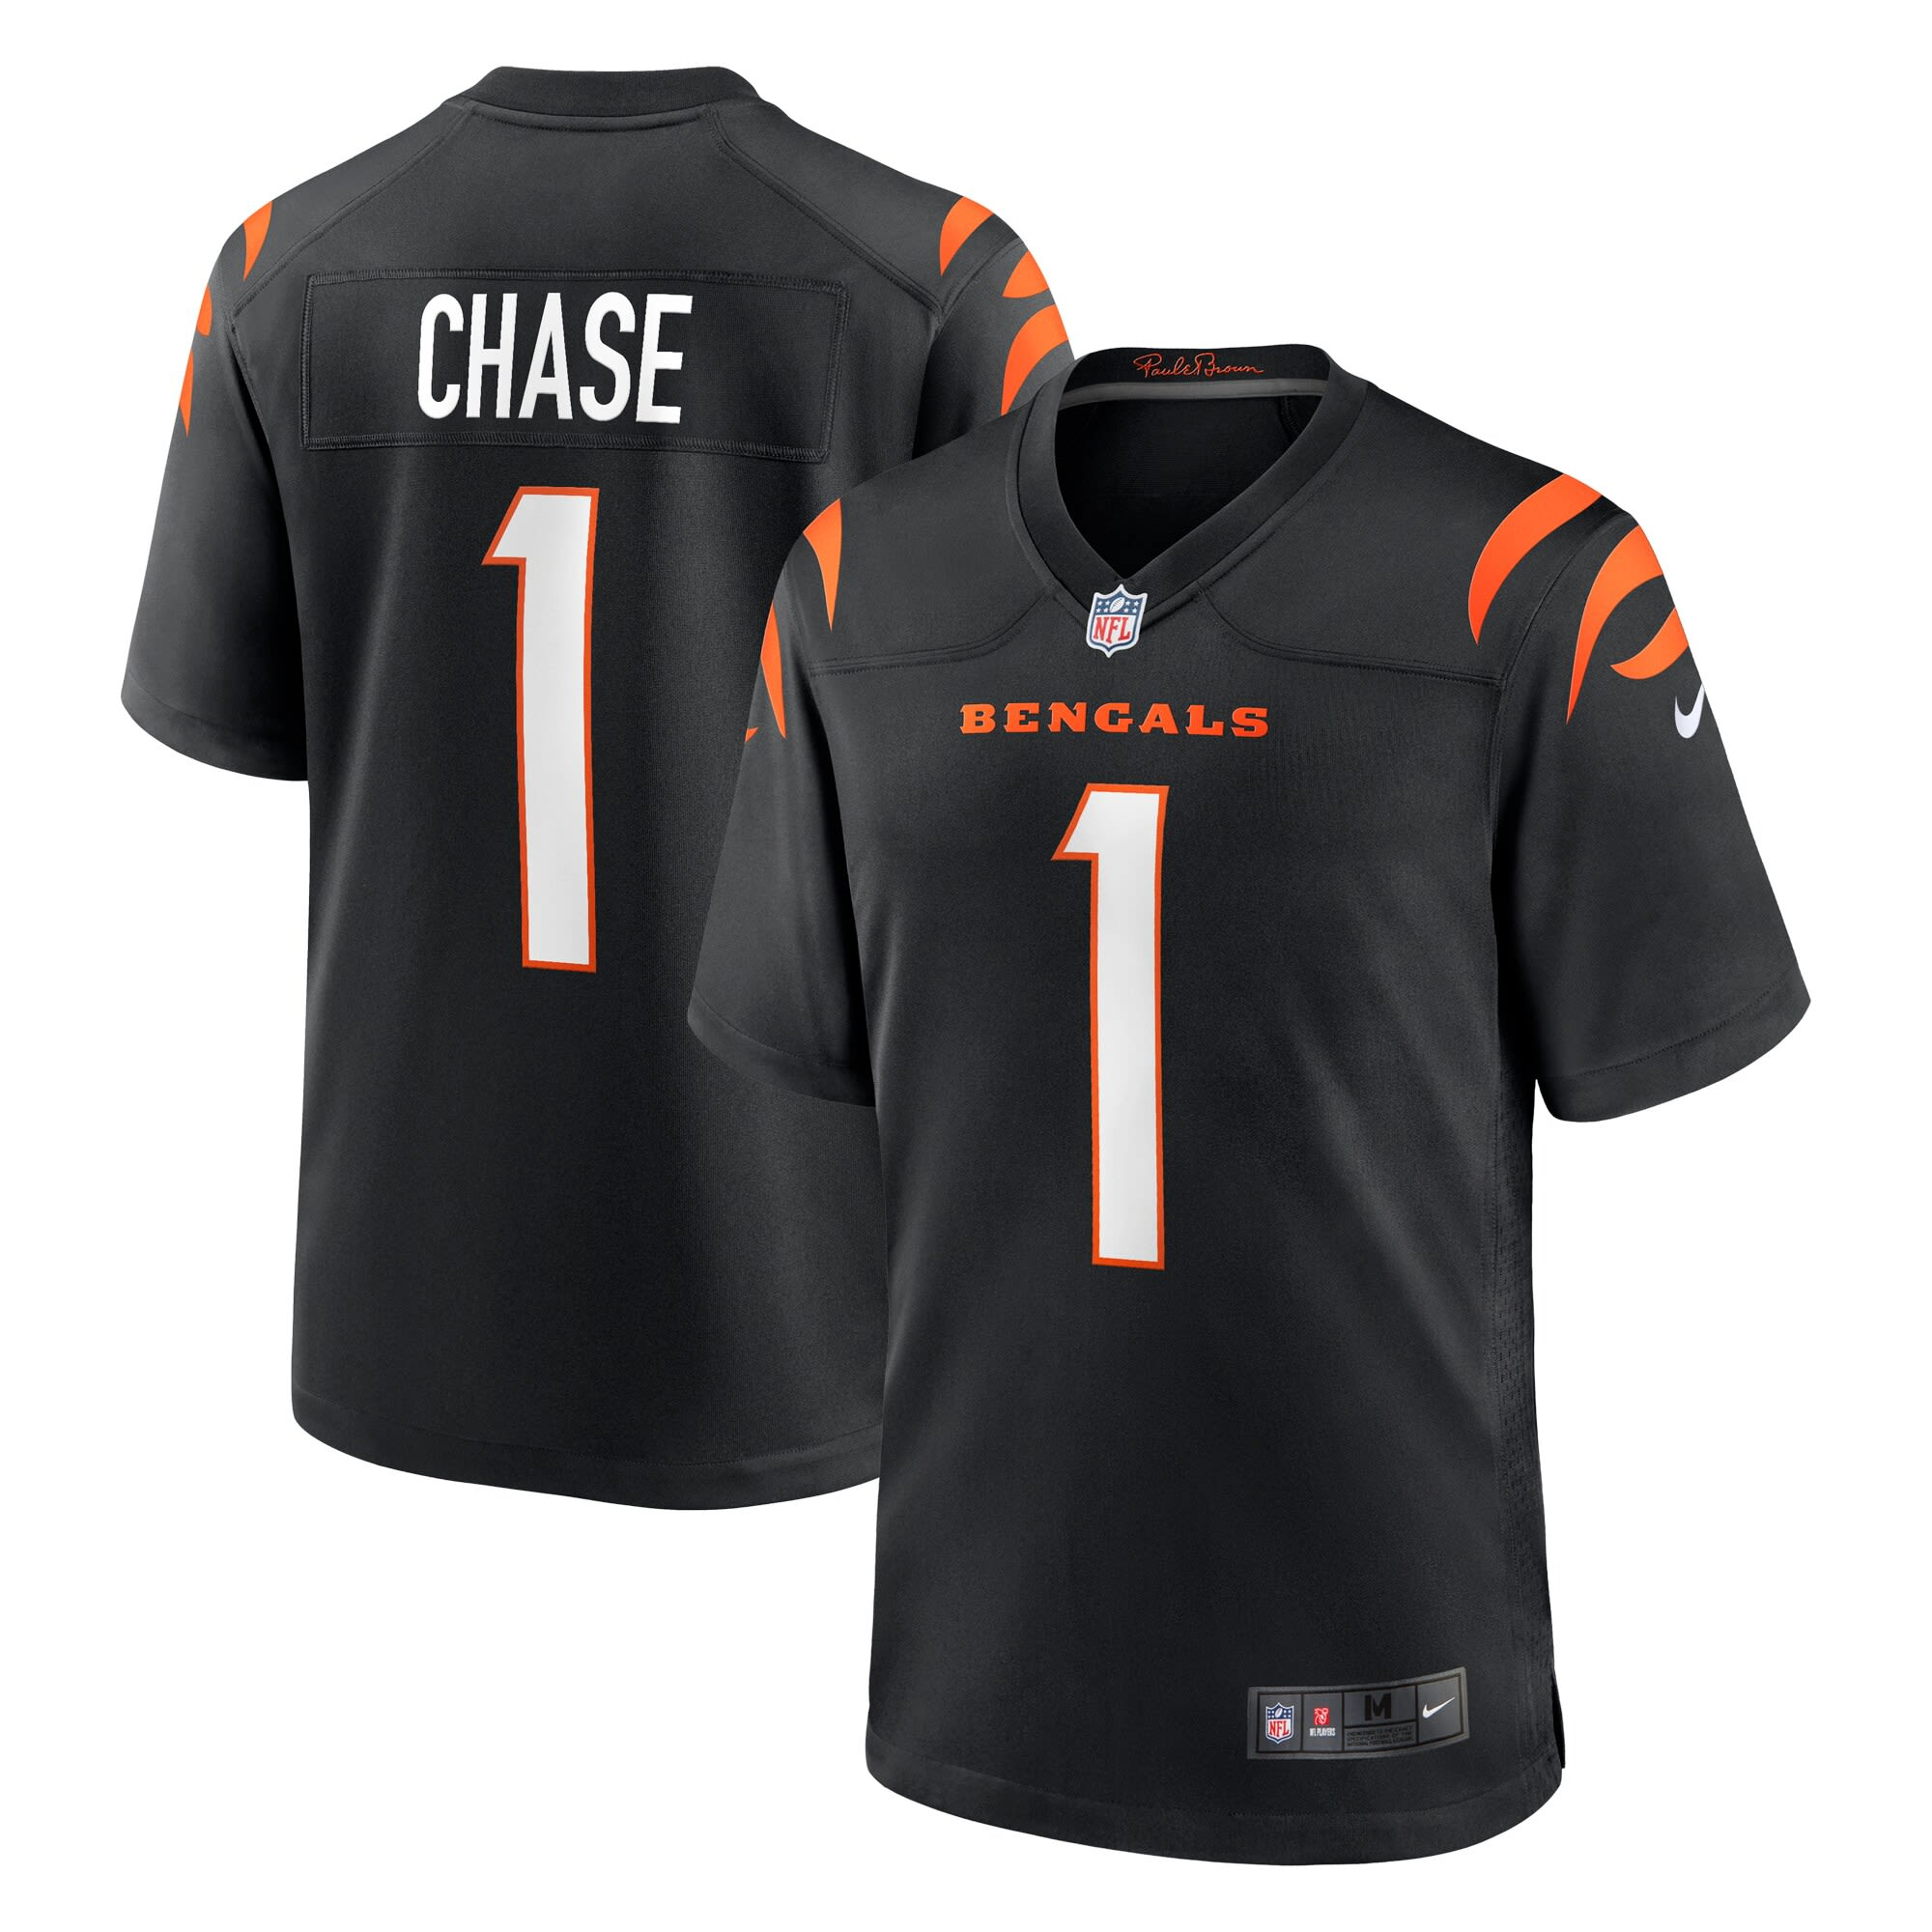 Cincinnati Bengals: Get your official Ja'Marr Chase gear now